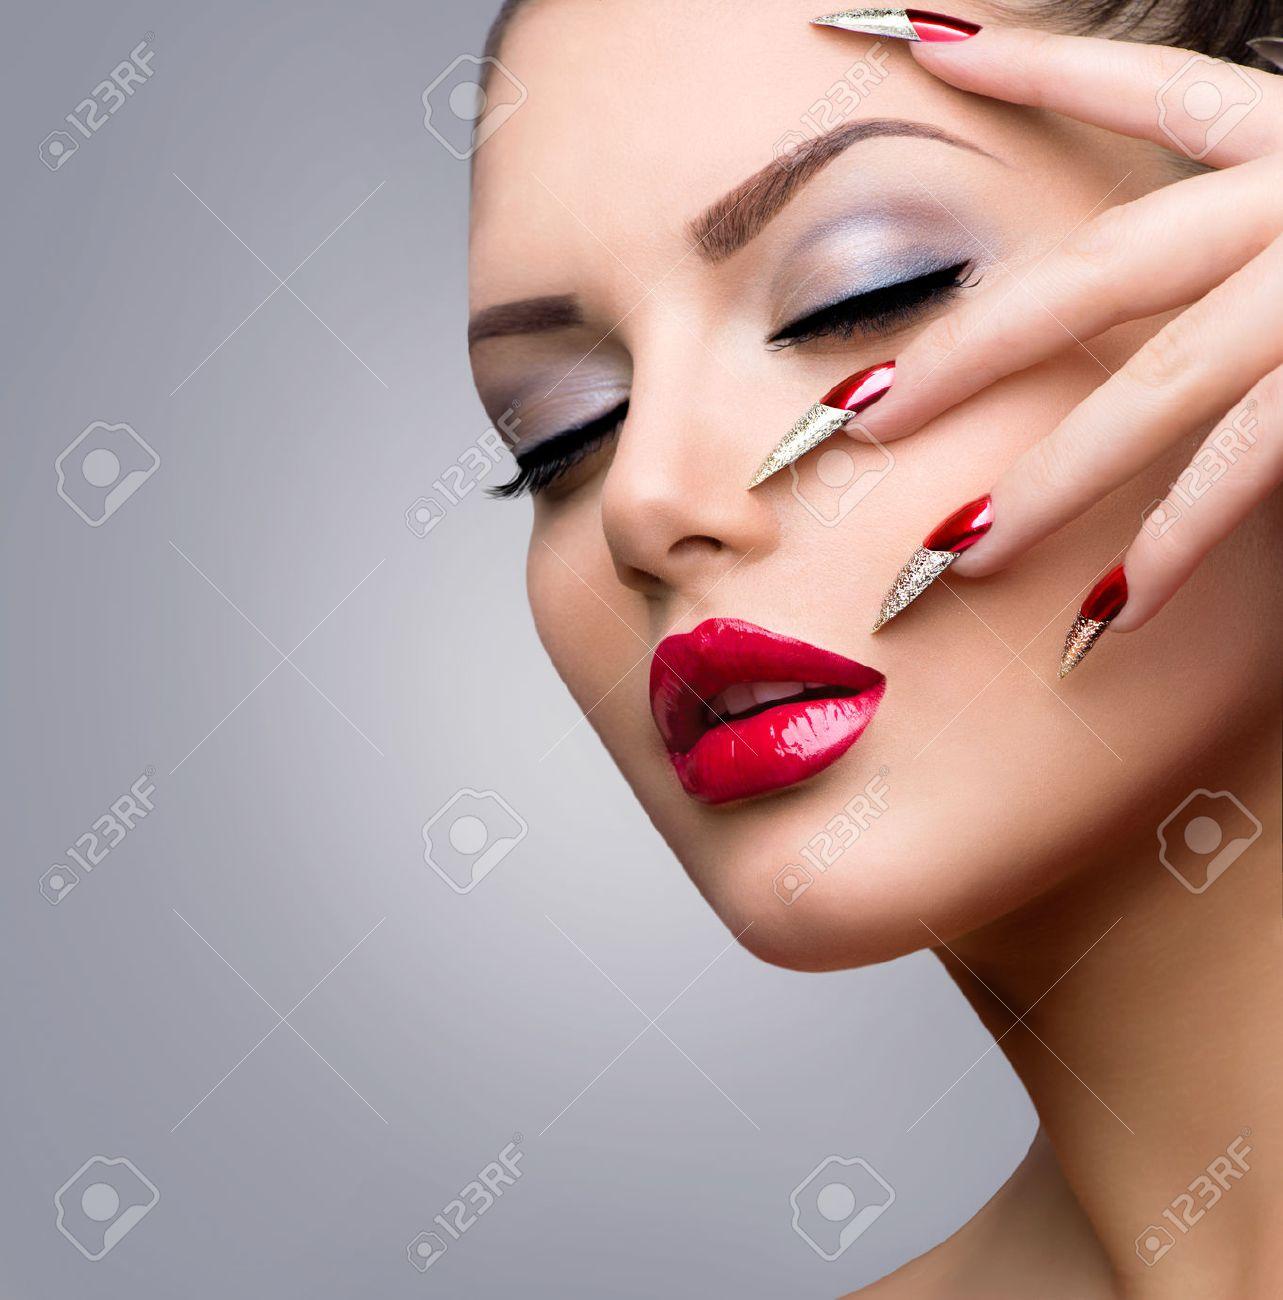 Fashion Beauty Model Girl  Manicure and Make-up Stock Photo - 24166041